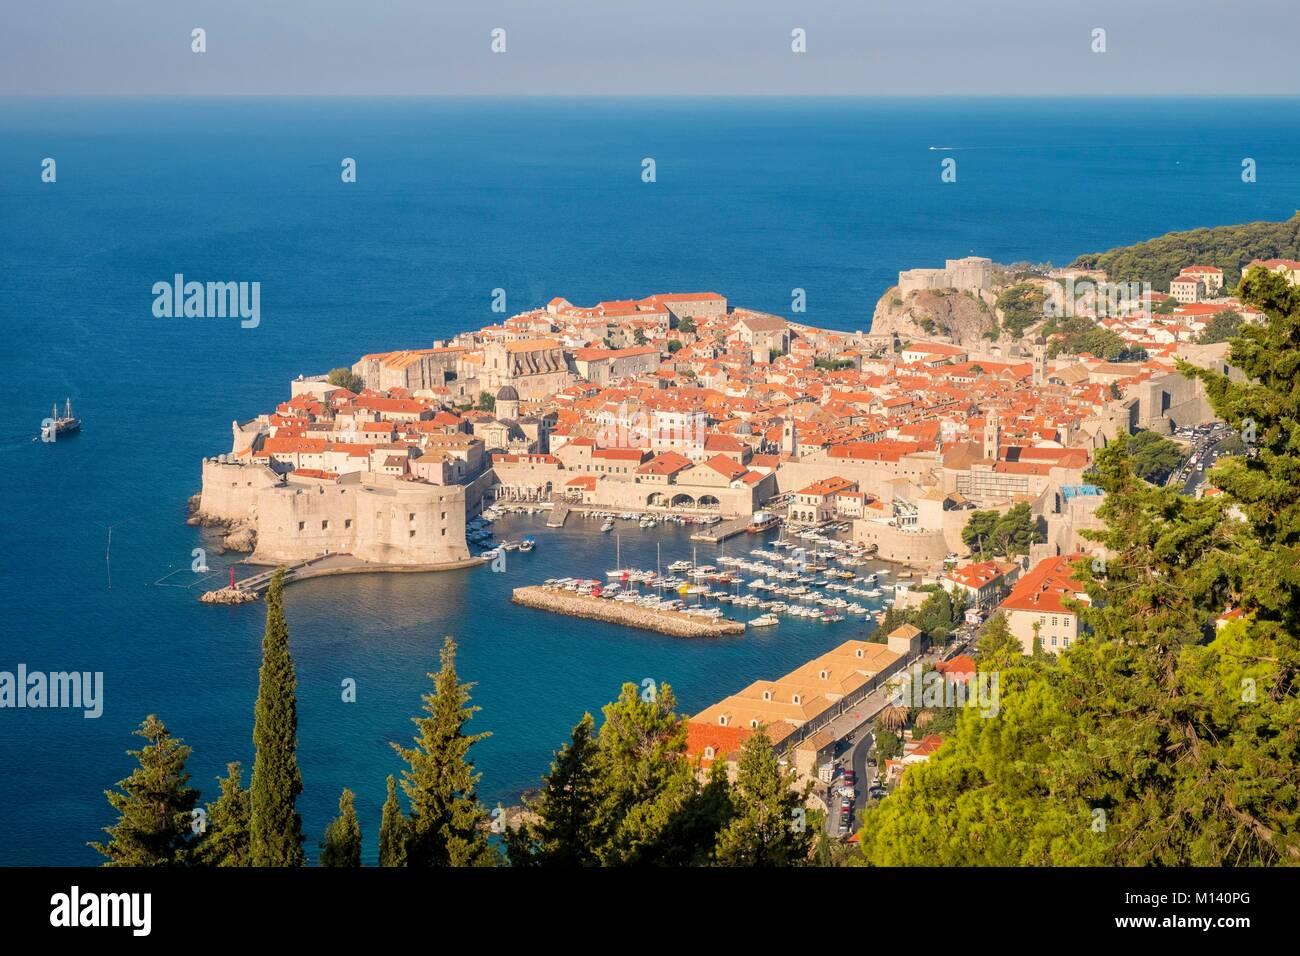 Croatia, Central Dalmatia, Dalmatian coast, Dubrovnik, Historic Centre listed as World Heritage by UNESCO - Stock Image